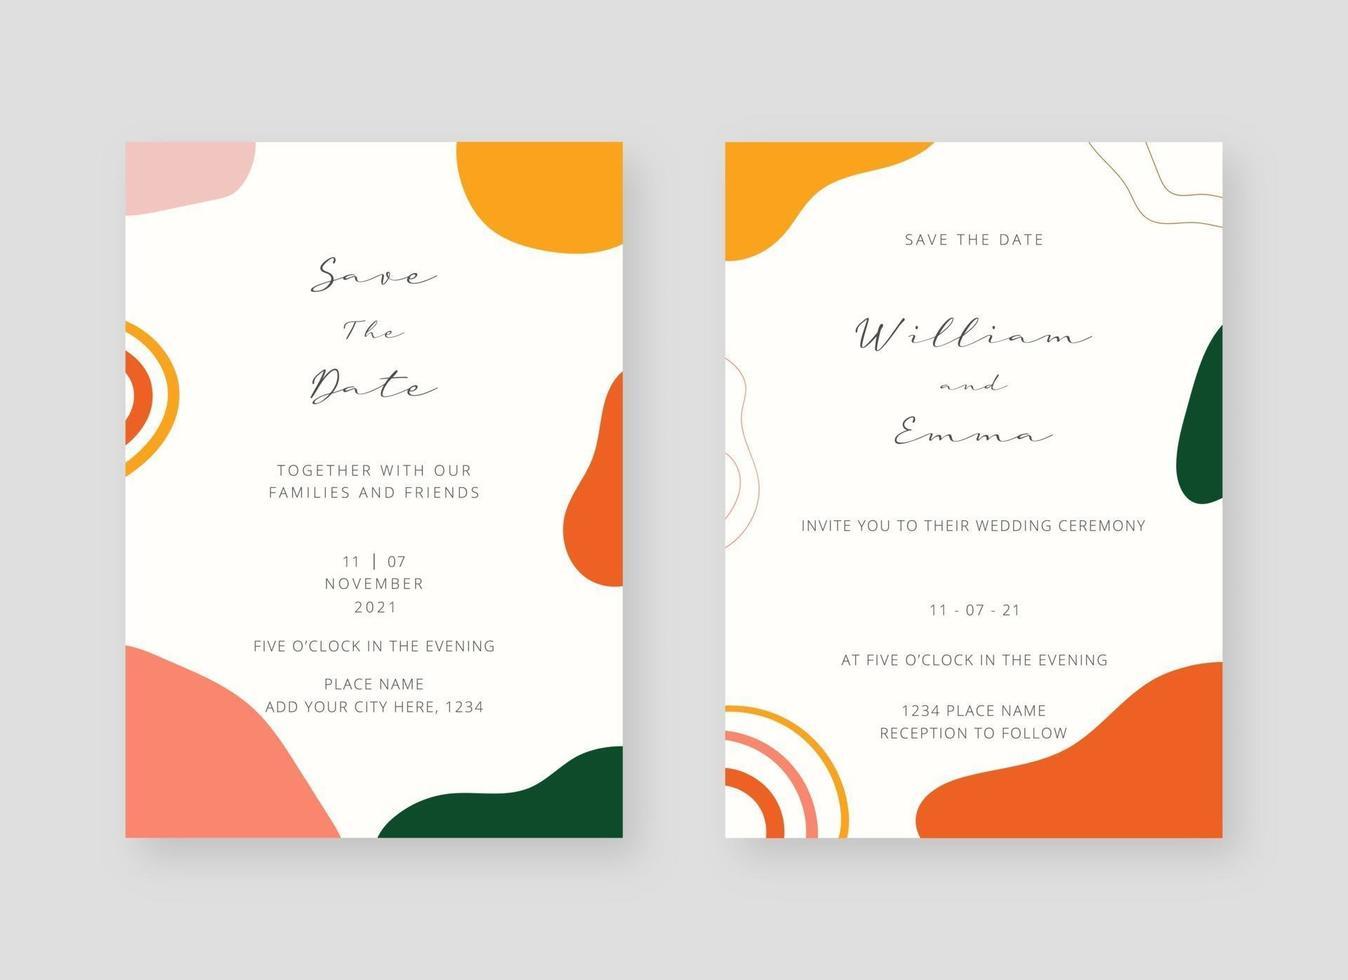 https www vecteezy com vector art 2065767 invitation card template set of wedding invitation card template design vector decorative design background